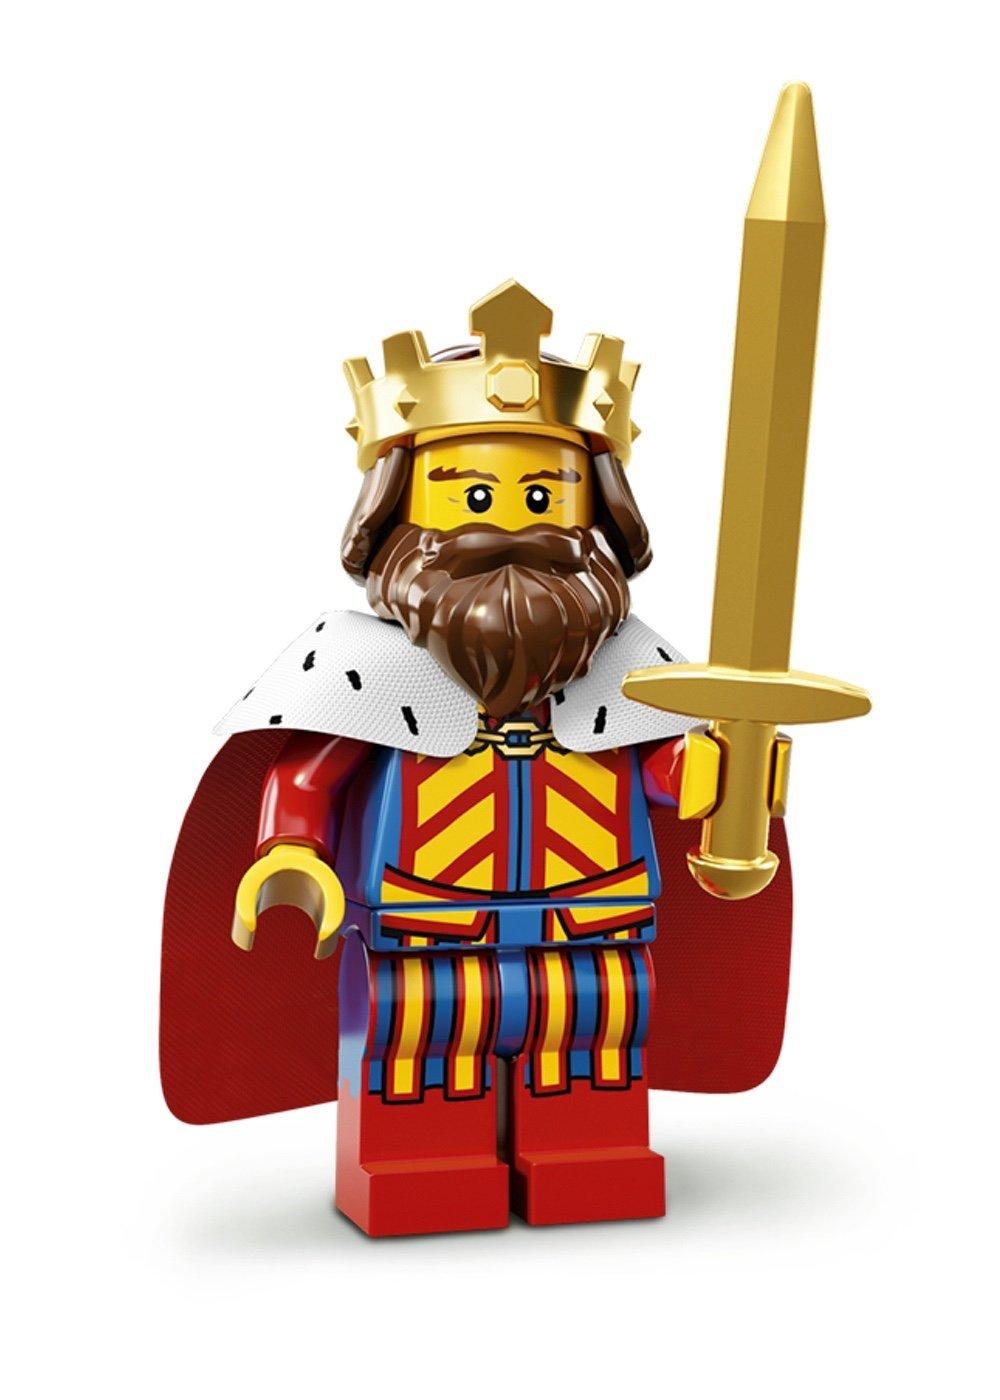 Classic King (Minifigures)